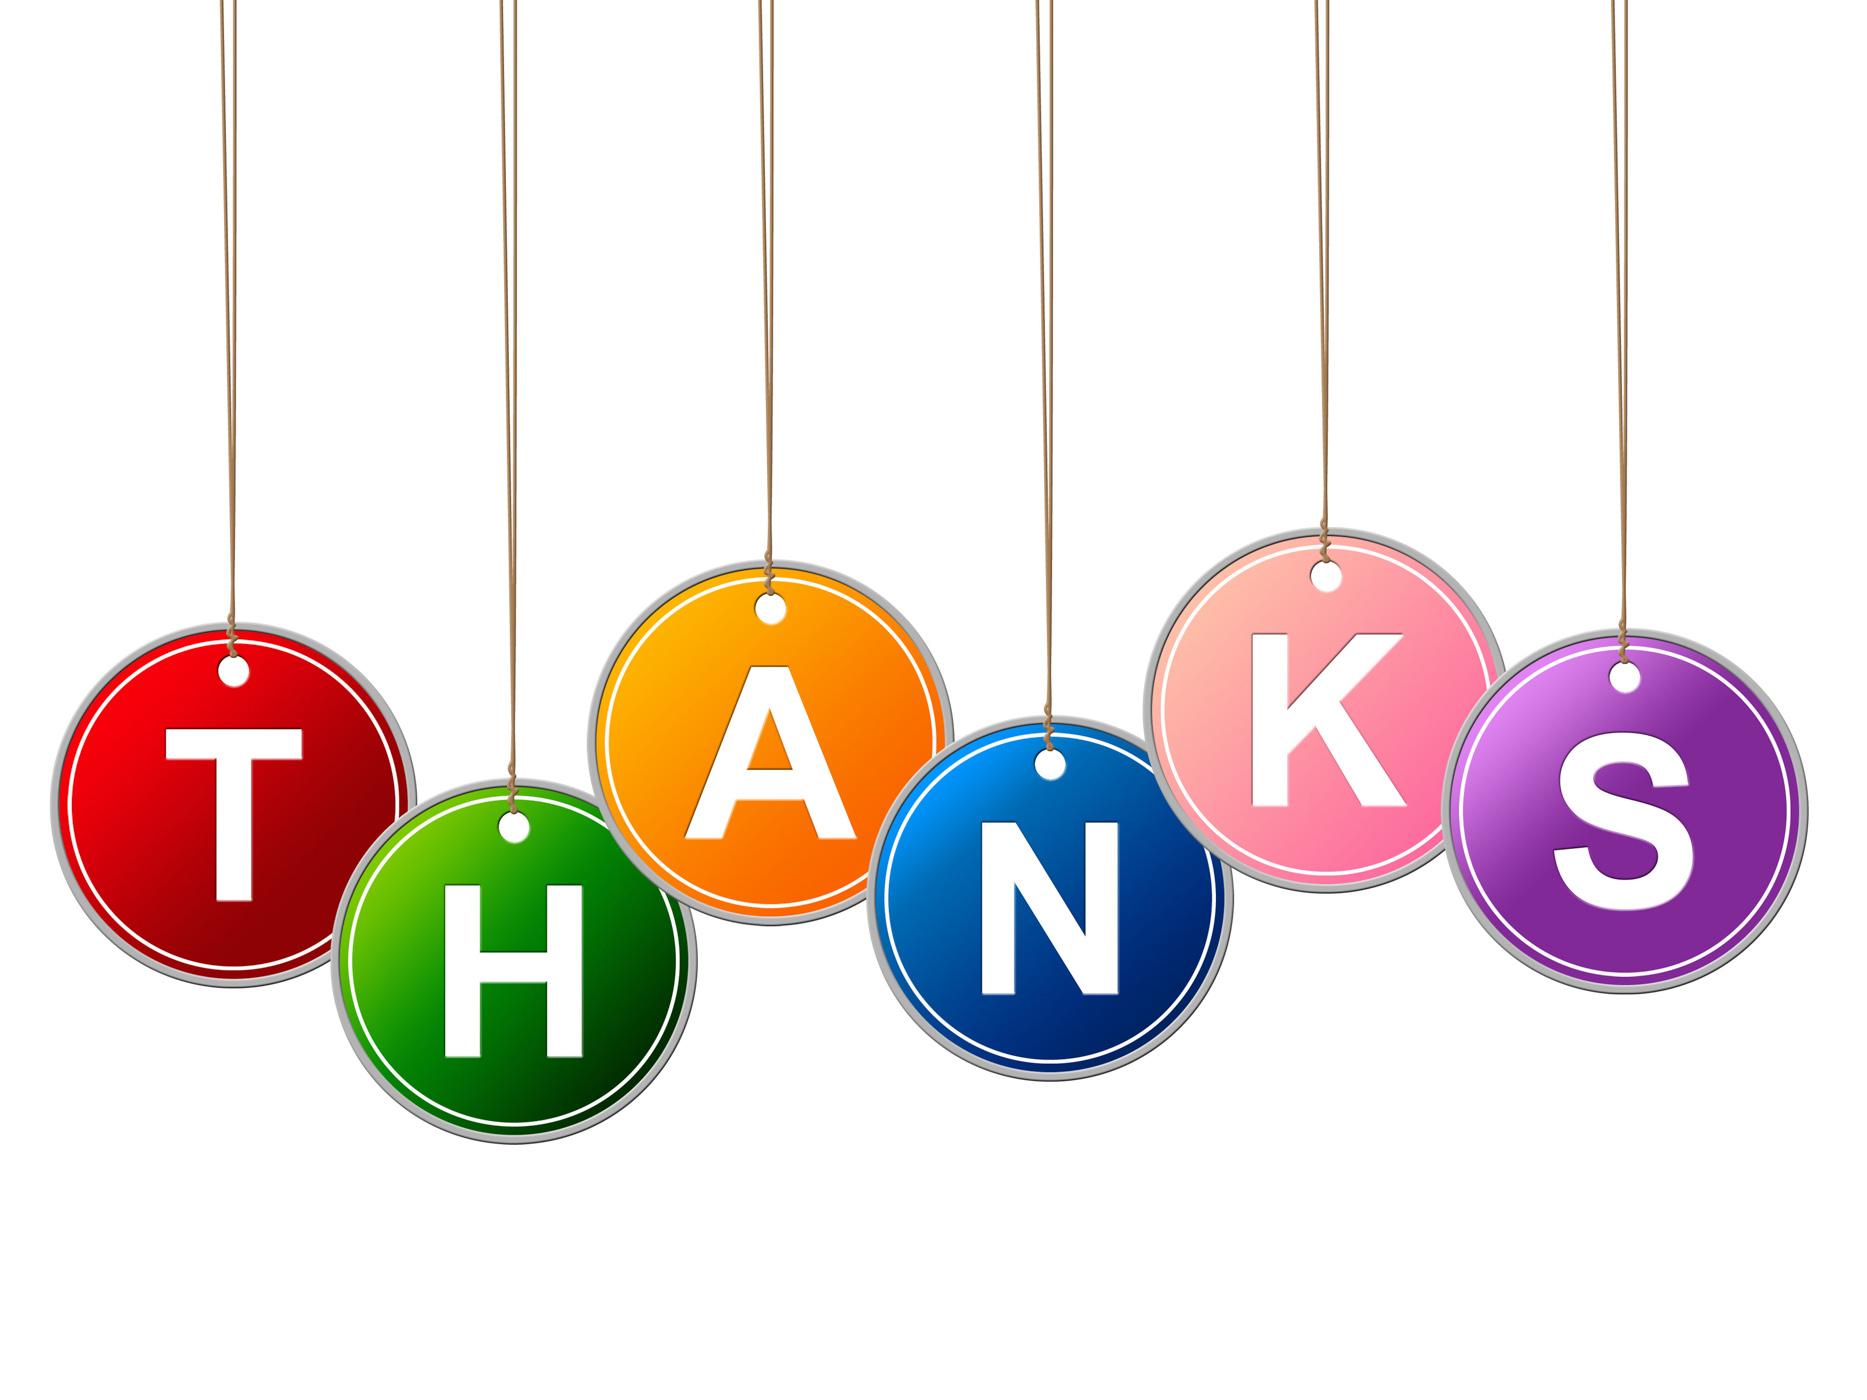 Thank You Shows Many Thanks And Appreciate, Appreciate, Grateful, Gratefulness, Gratitude, HQ Photo